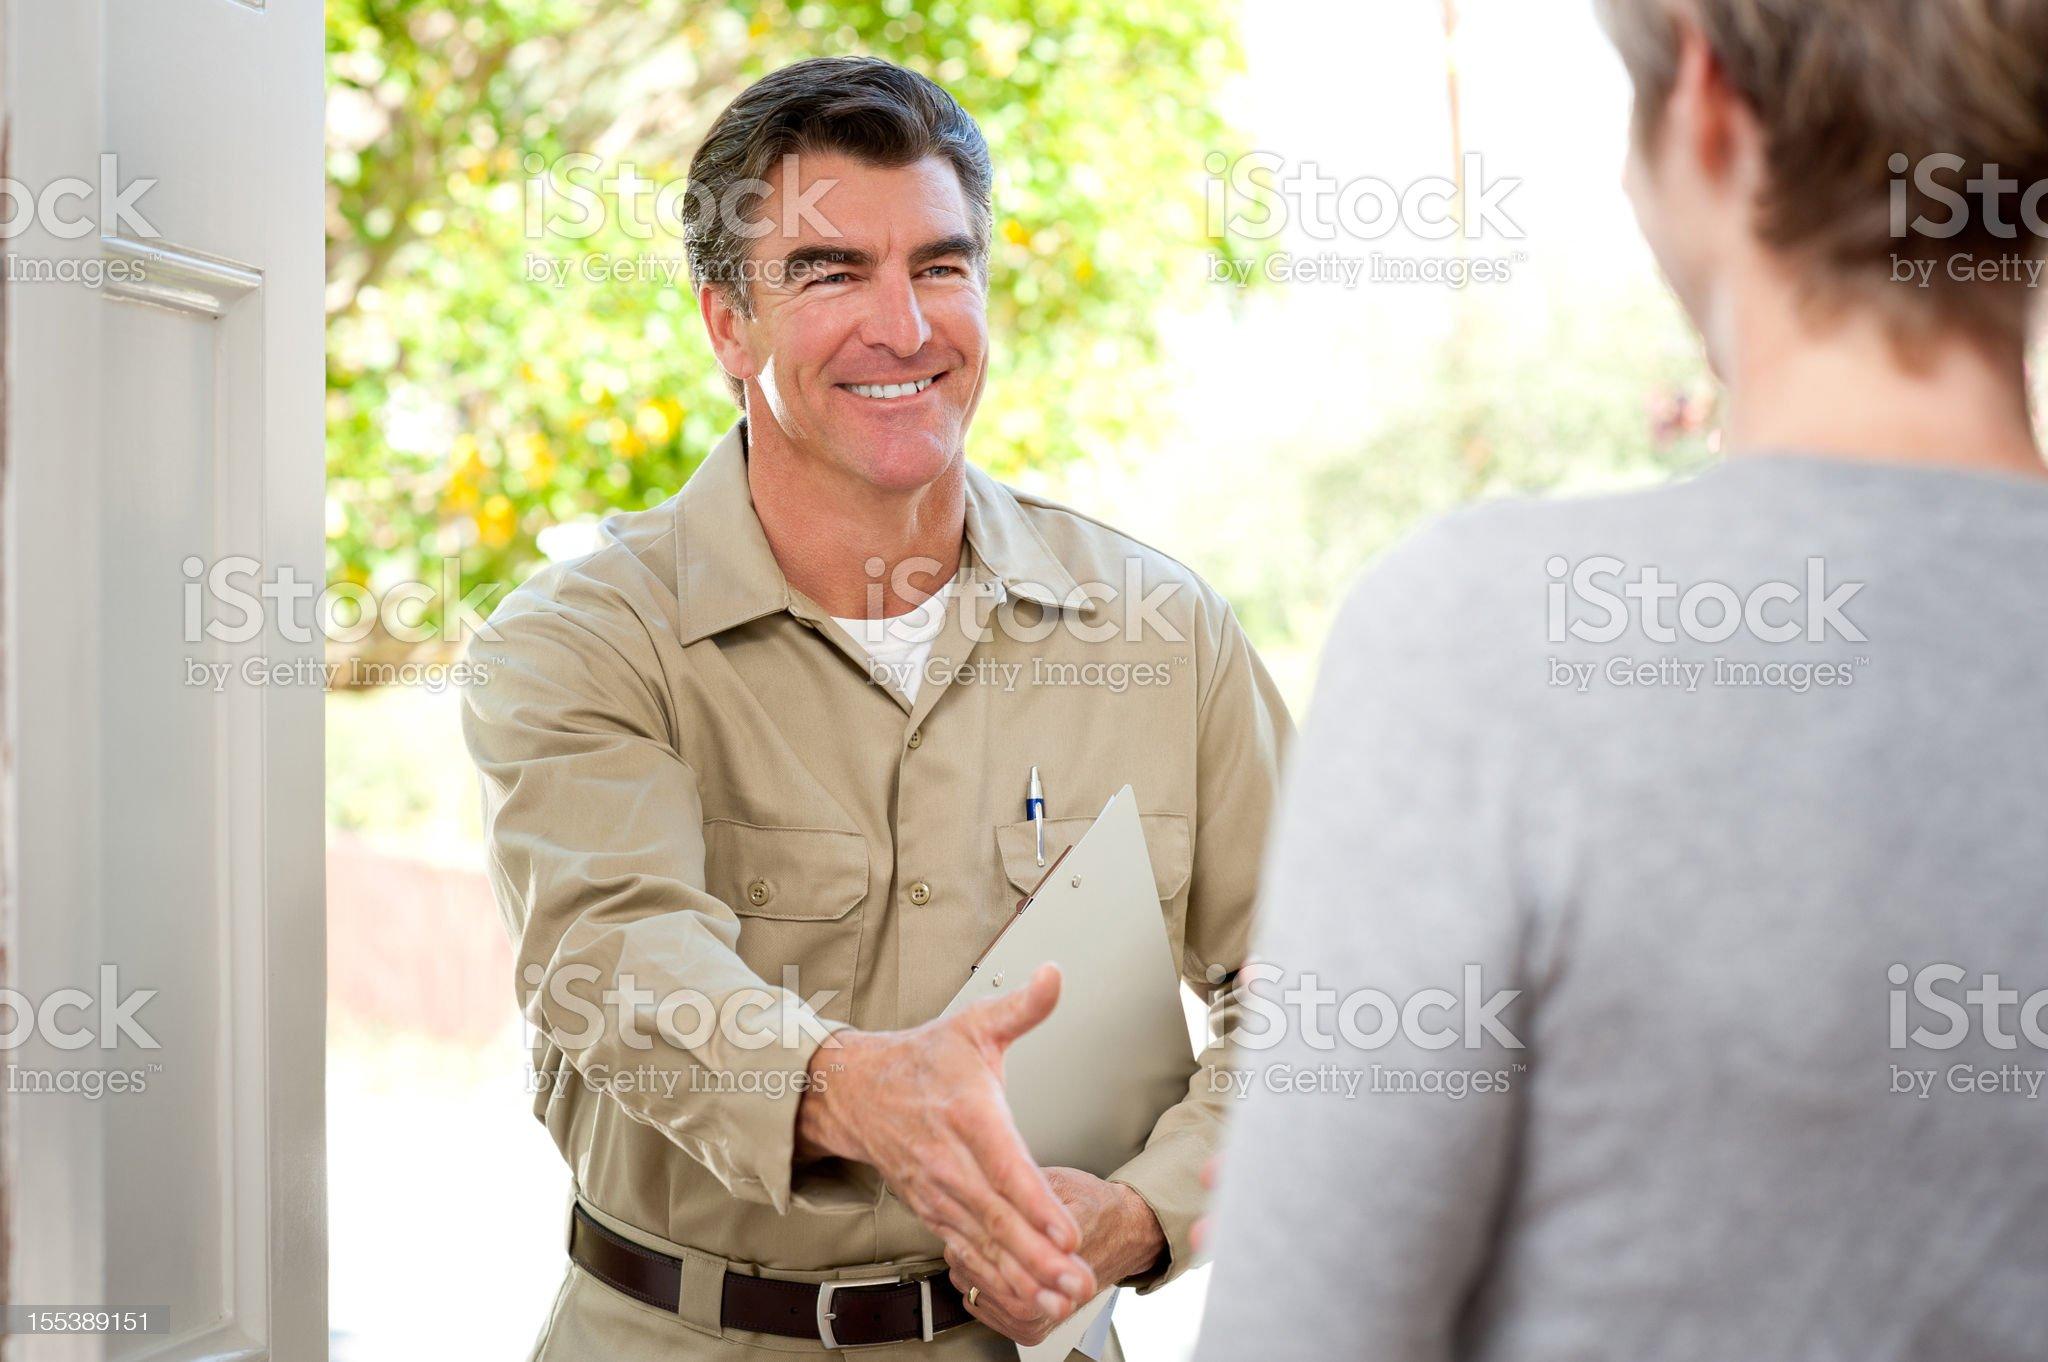 Repairman In Uniform Greeting Housewife royalty-free stock photo